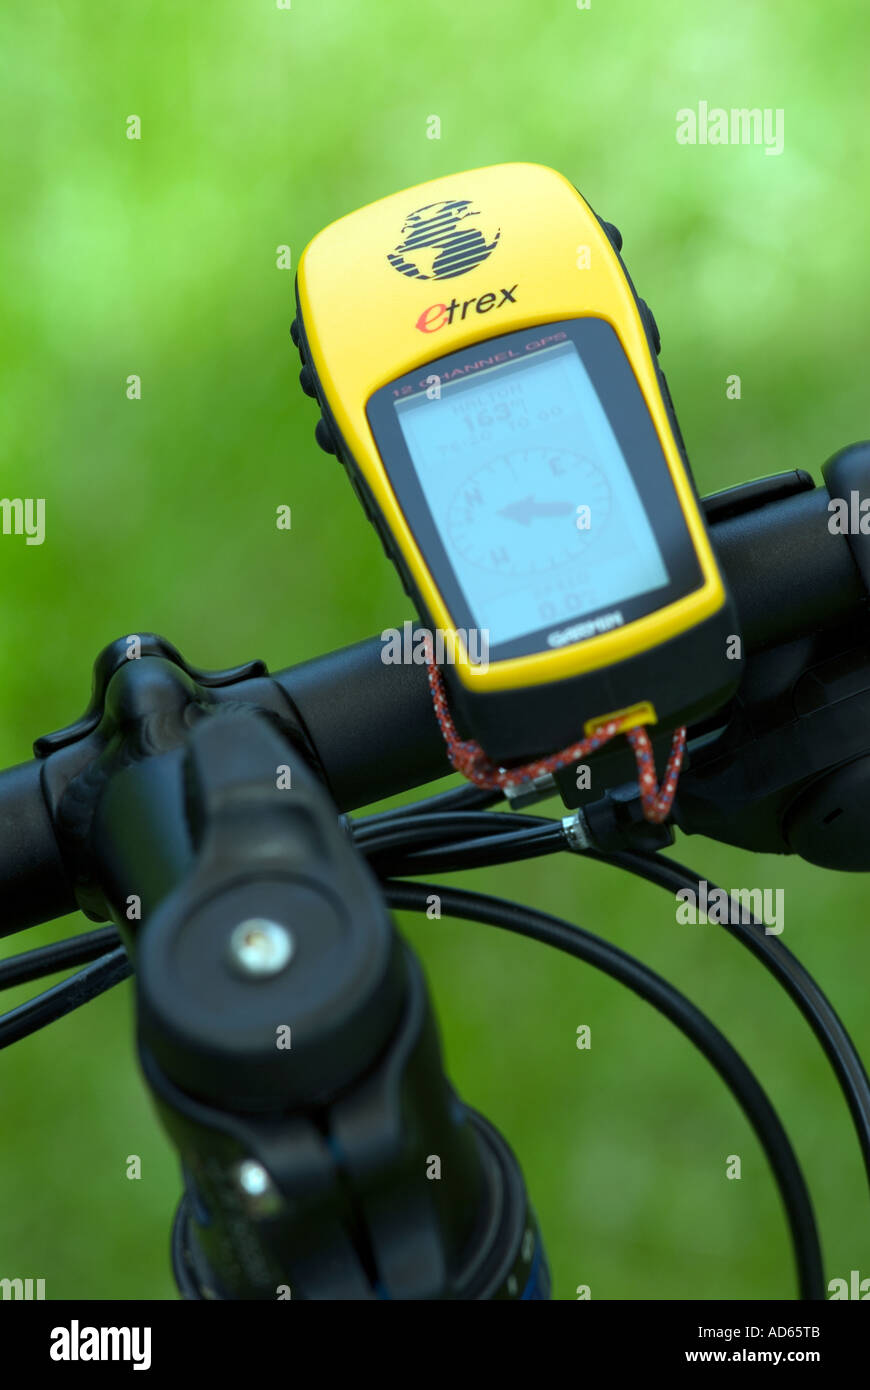 PICTURE CREDIT DOUG BLANE GPS Mountain Biking at the bike park Brickhill Woods Wobrn Sands - Stock Image